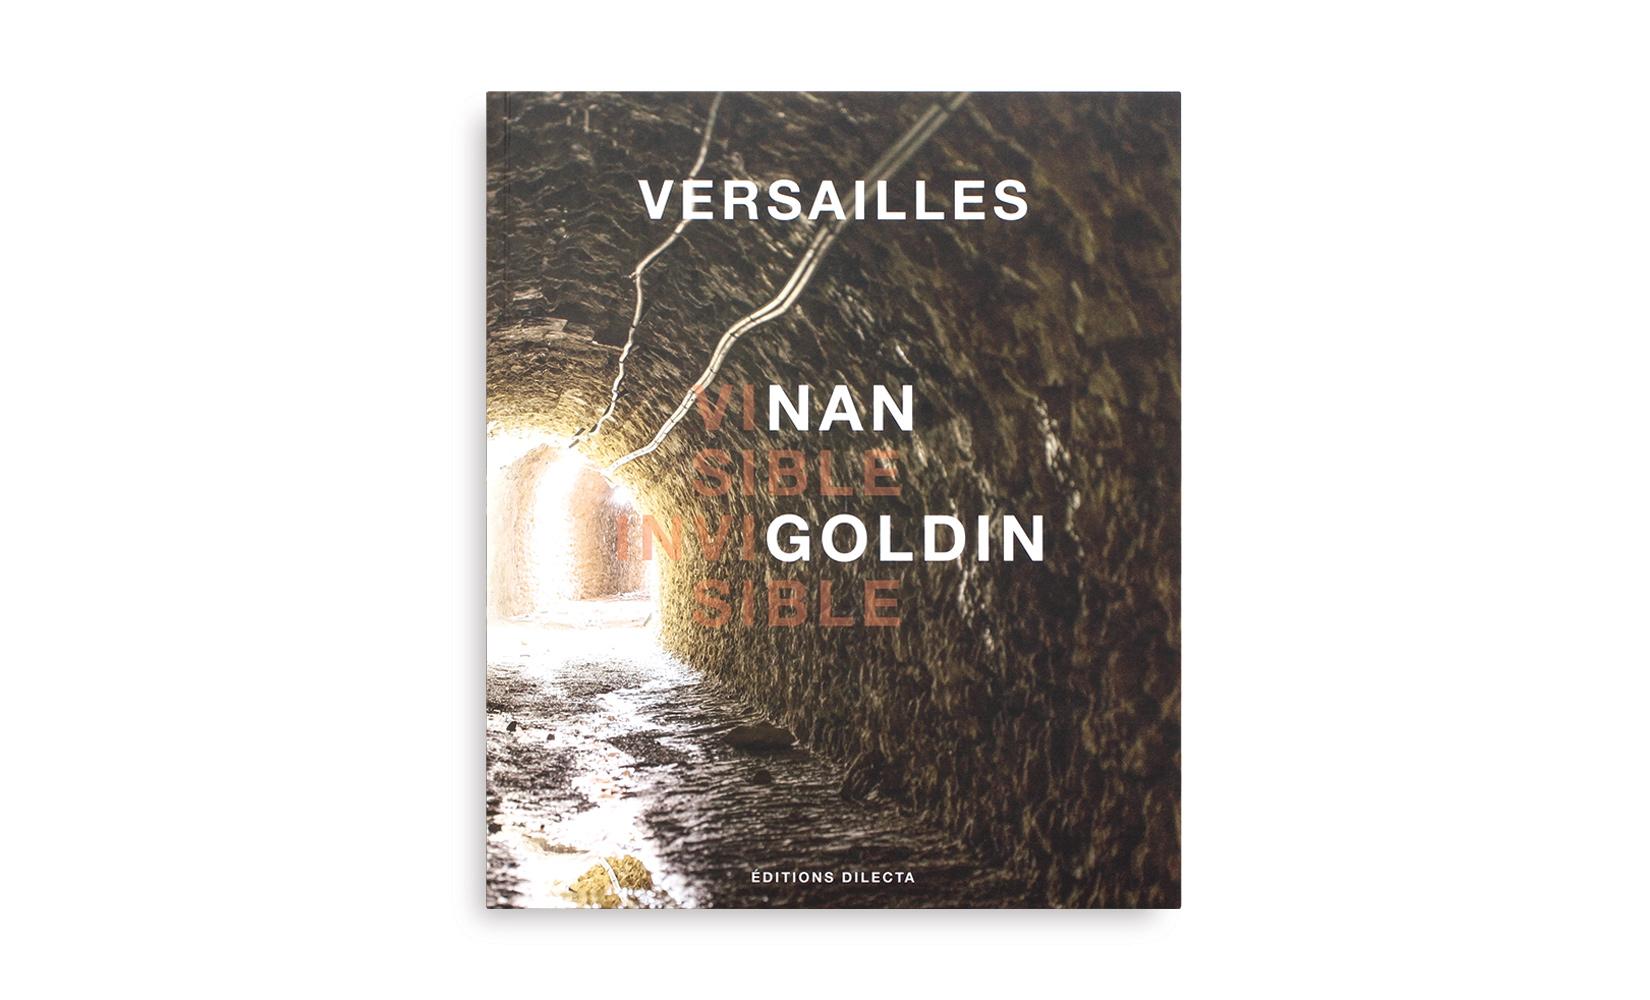 versailles-visible-invisible-toluca-studio-olivier-andreotti-NAN-GOLDIN-1.jpg